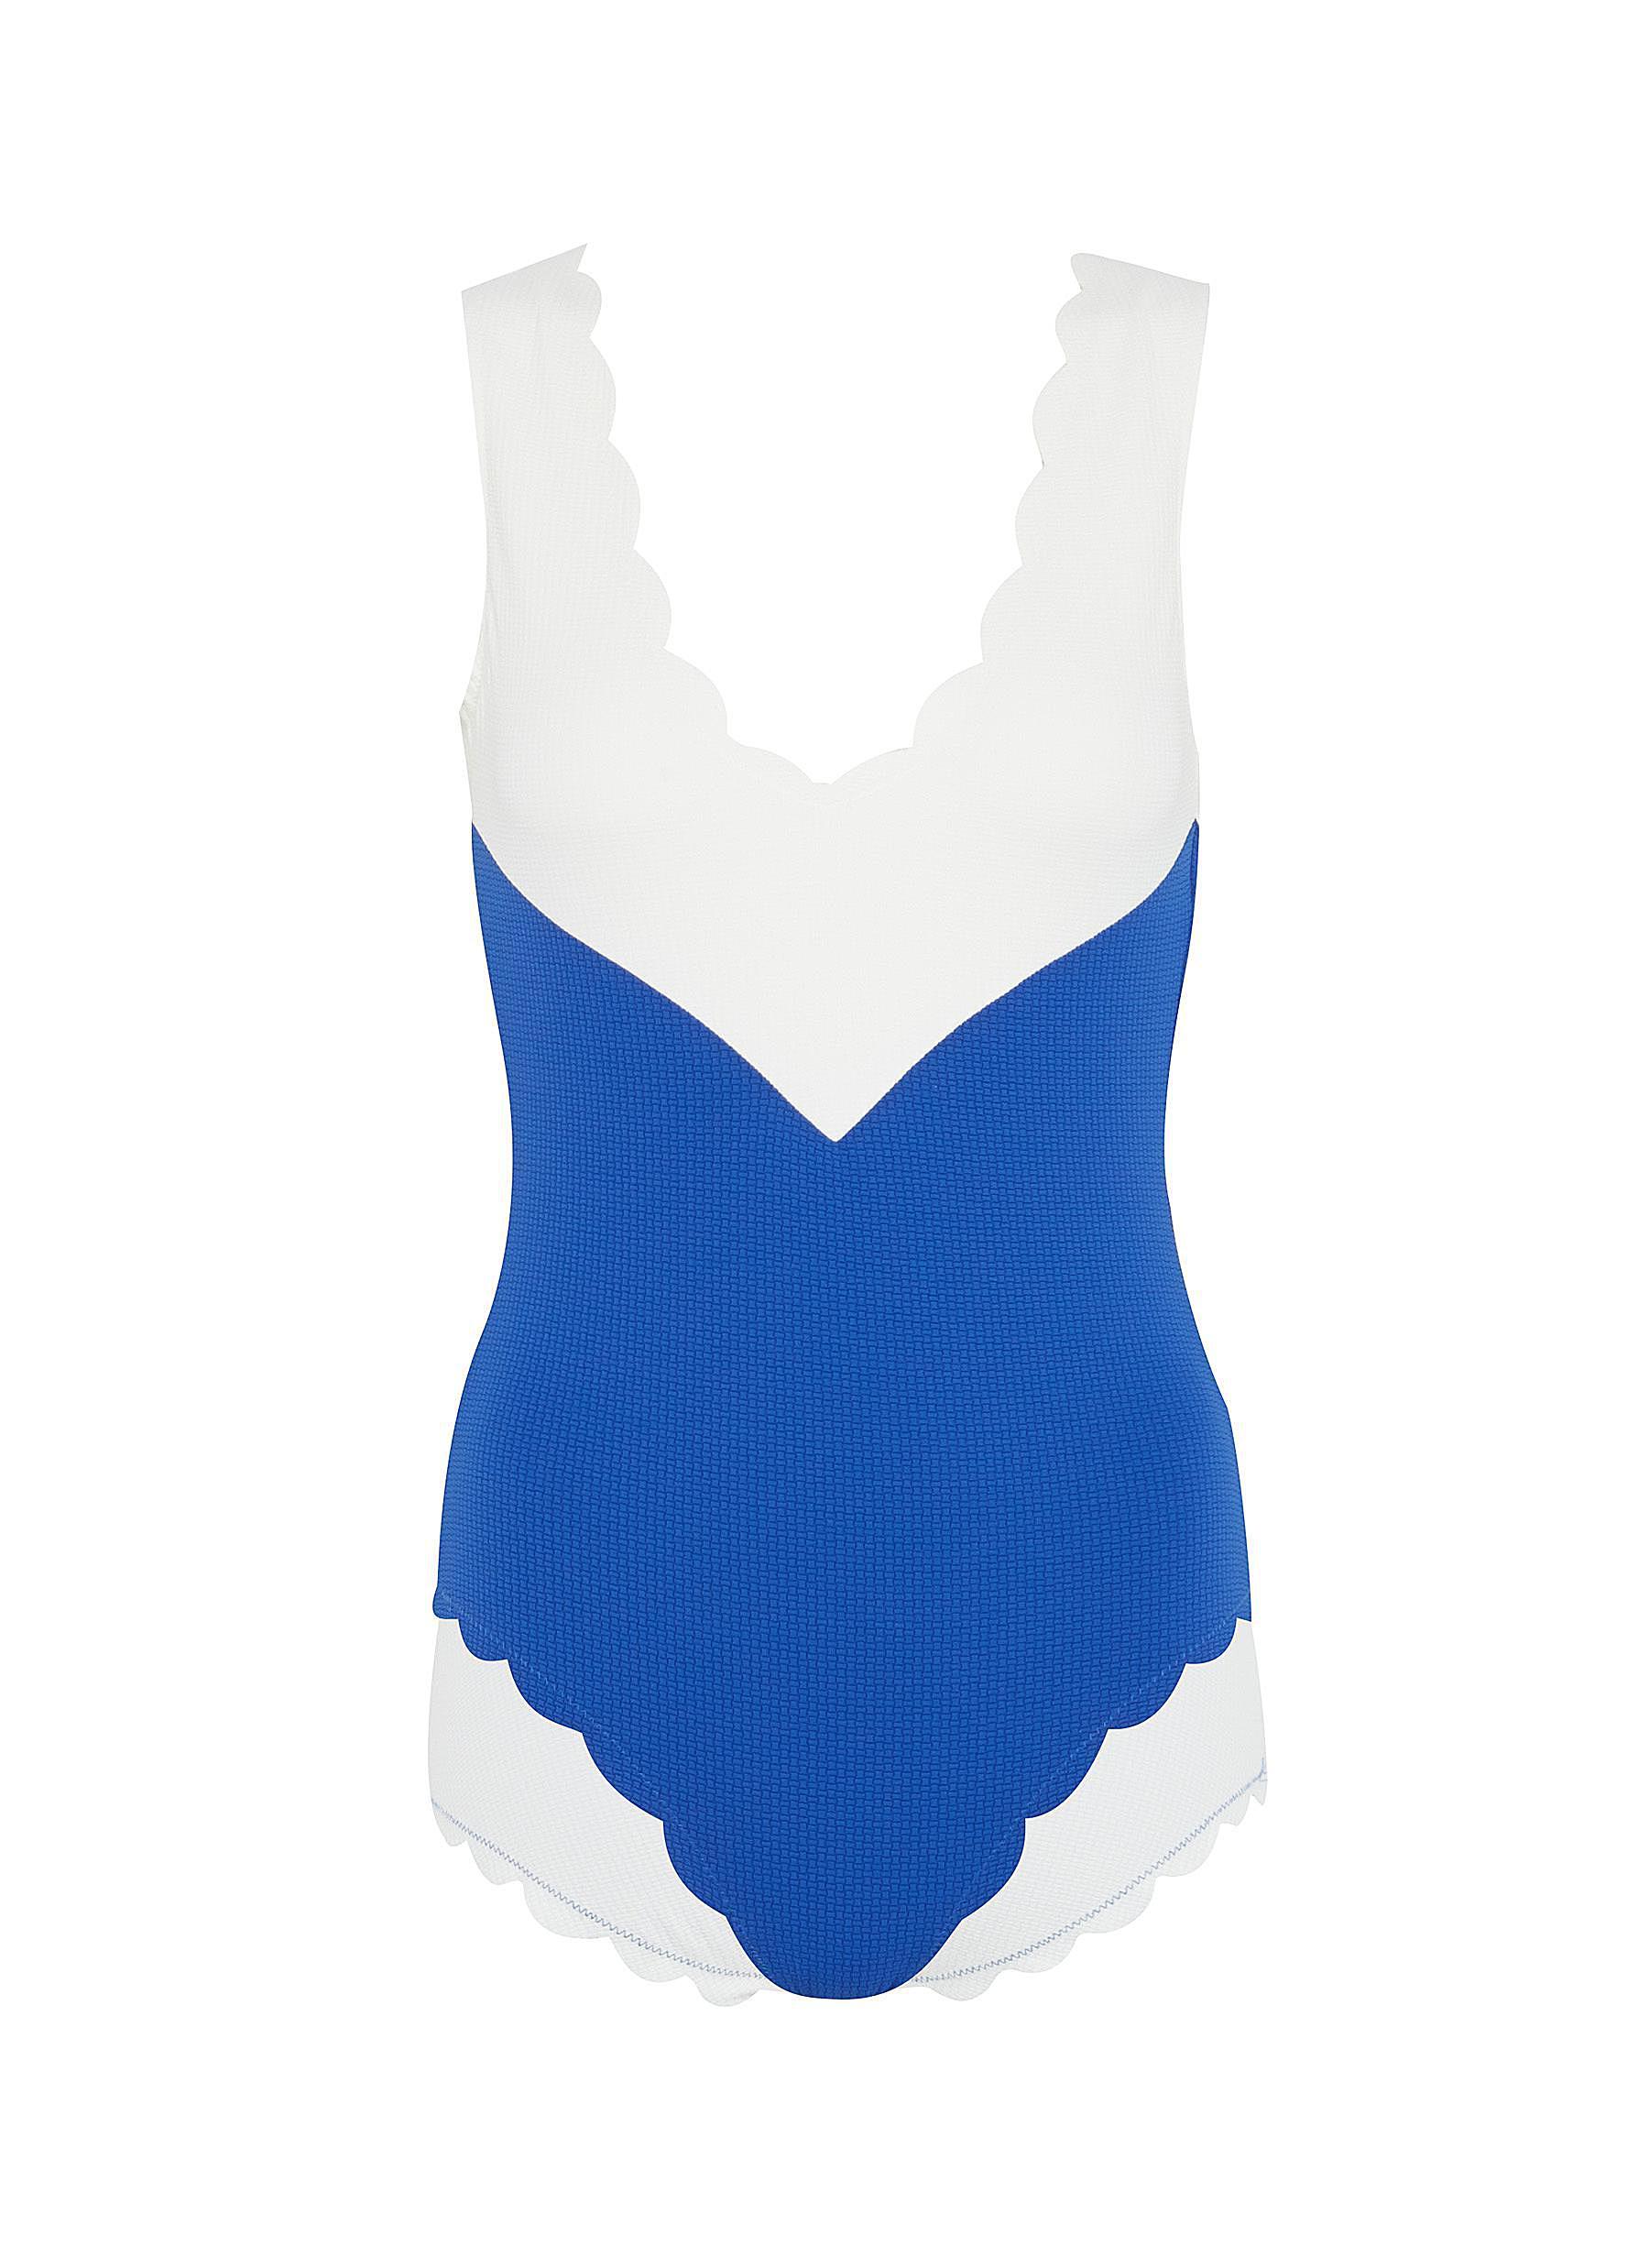 Kamas colourblock scalloped one-piece swimsuit by Marysia